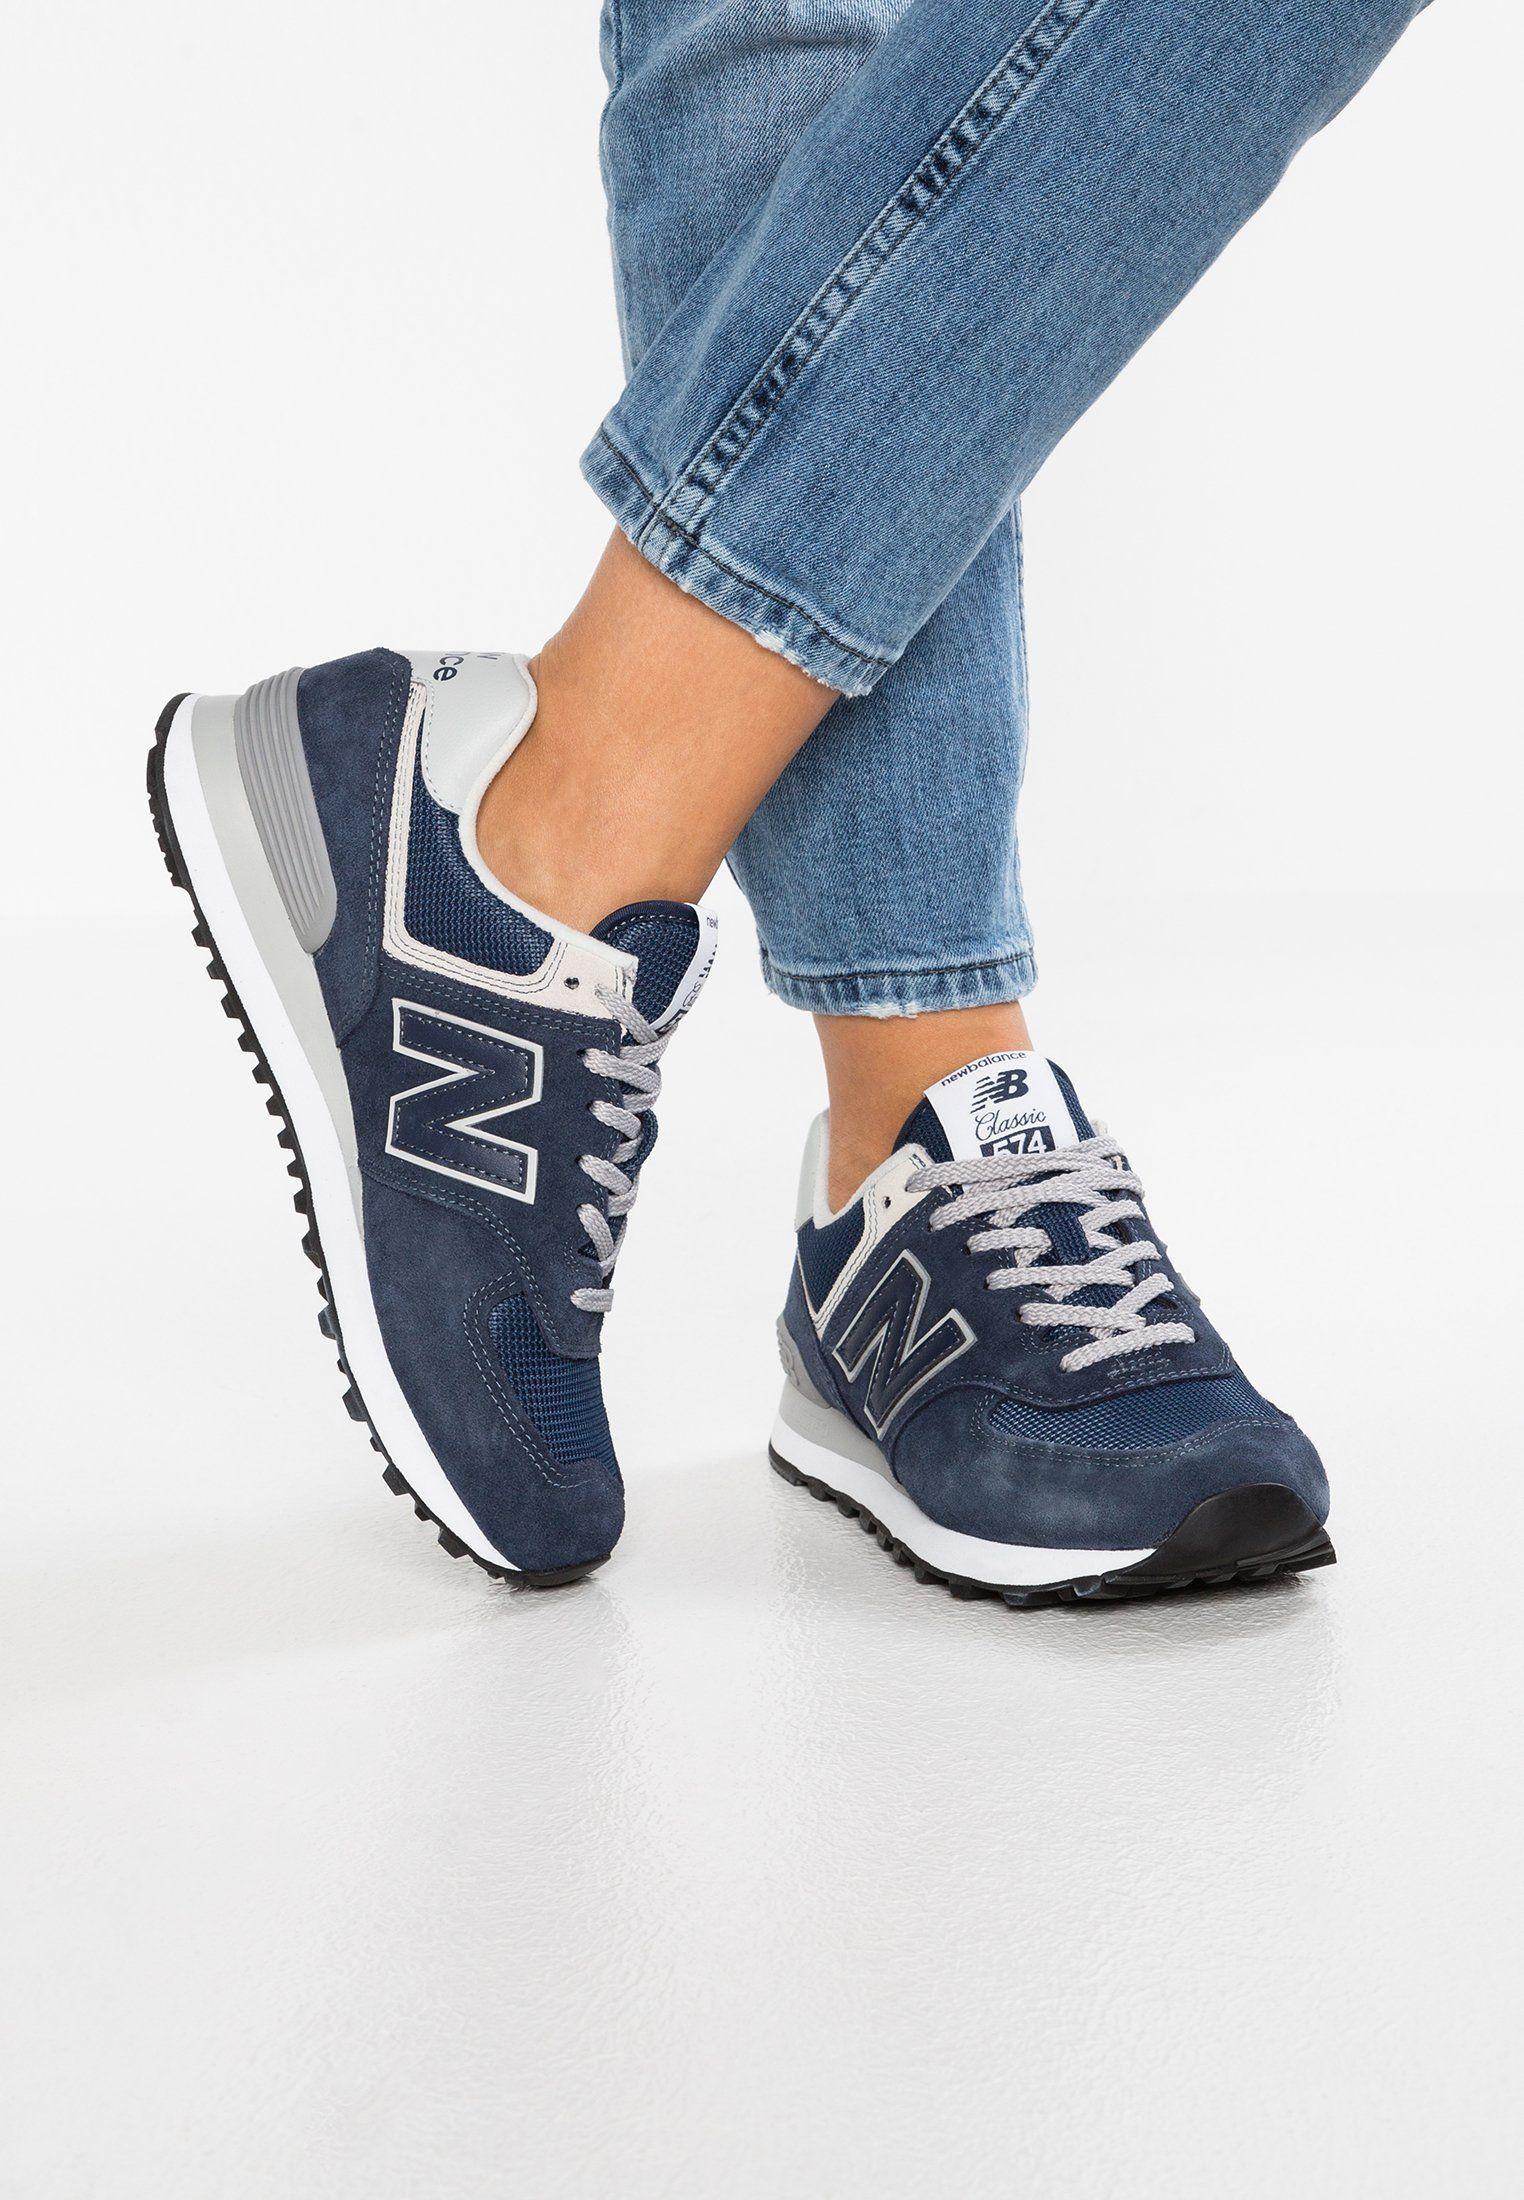 New Balance WL574 - Sneakers laag - navy - Zalando.nl ...